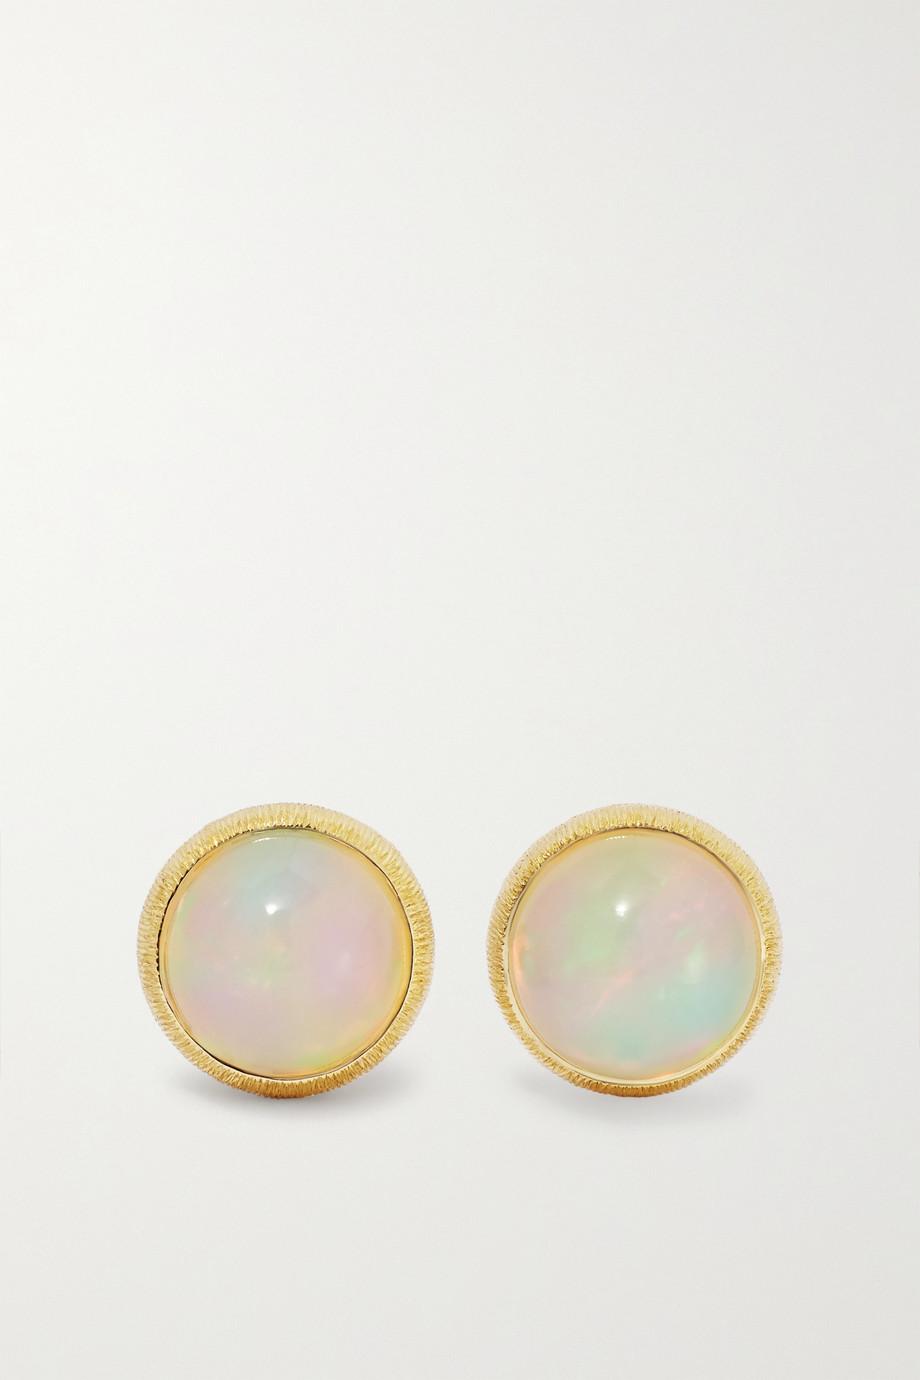 OLE LYNGGAARD COPENHAGEN Lotus Ohrstecker aus 18 Karat Gold mit Opalen